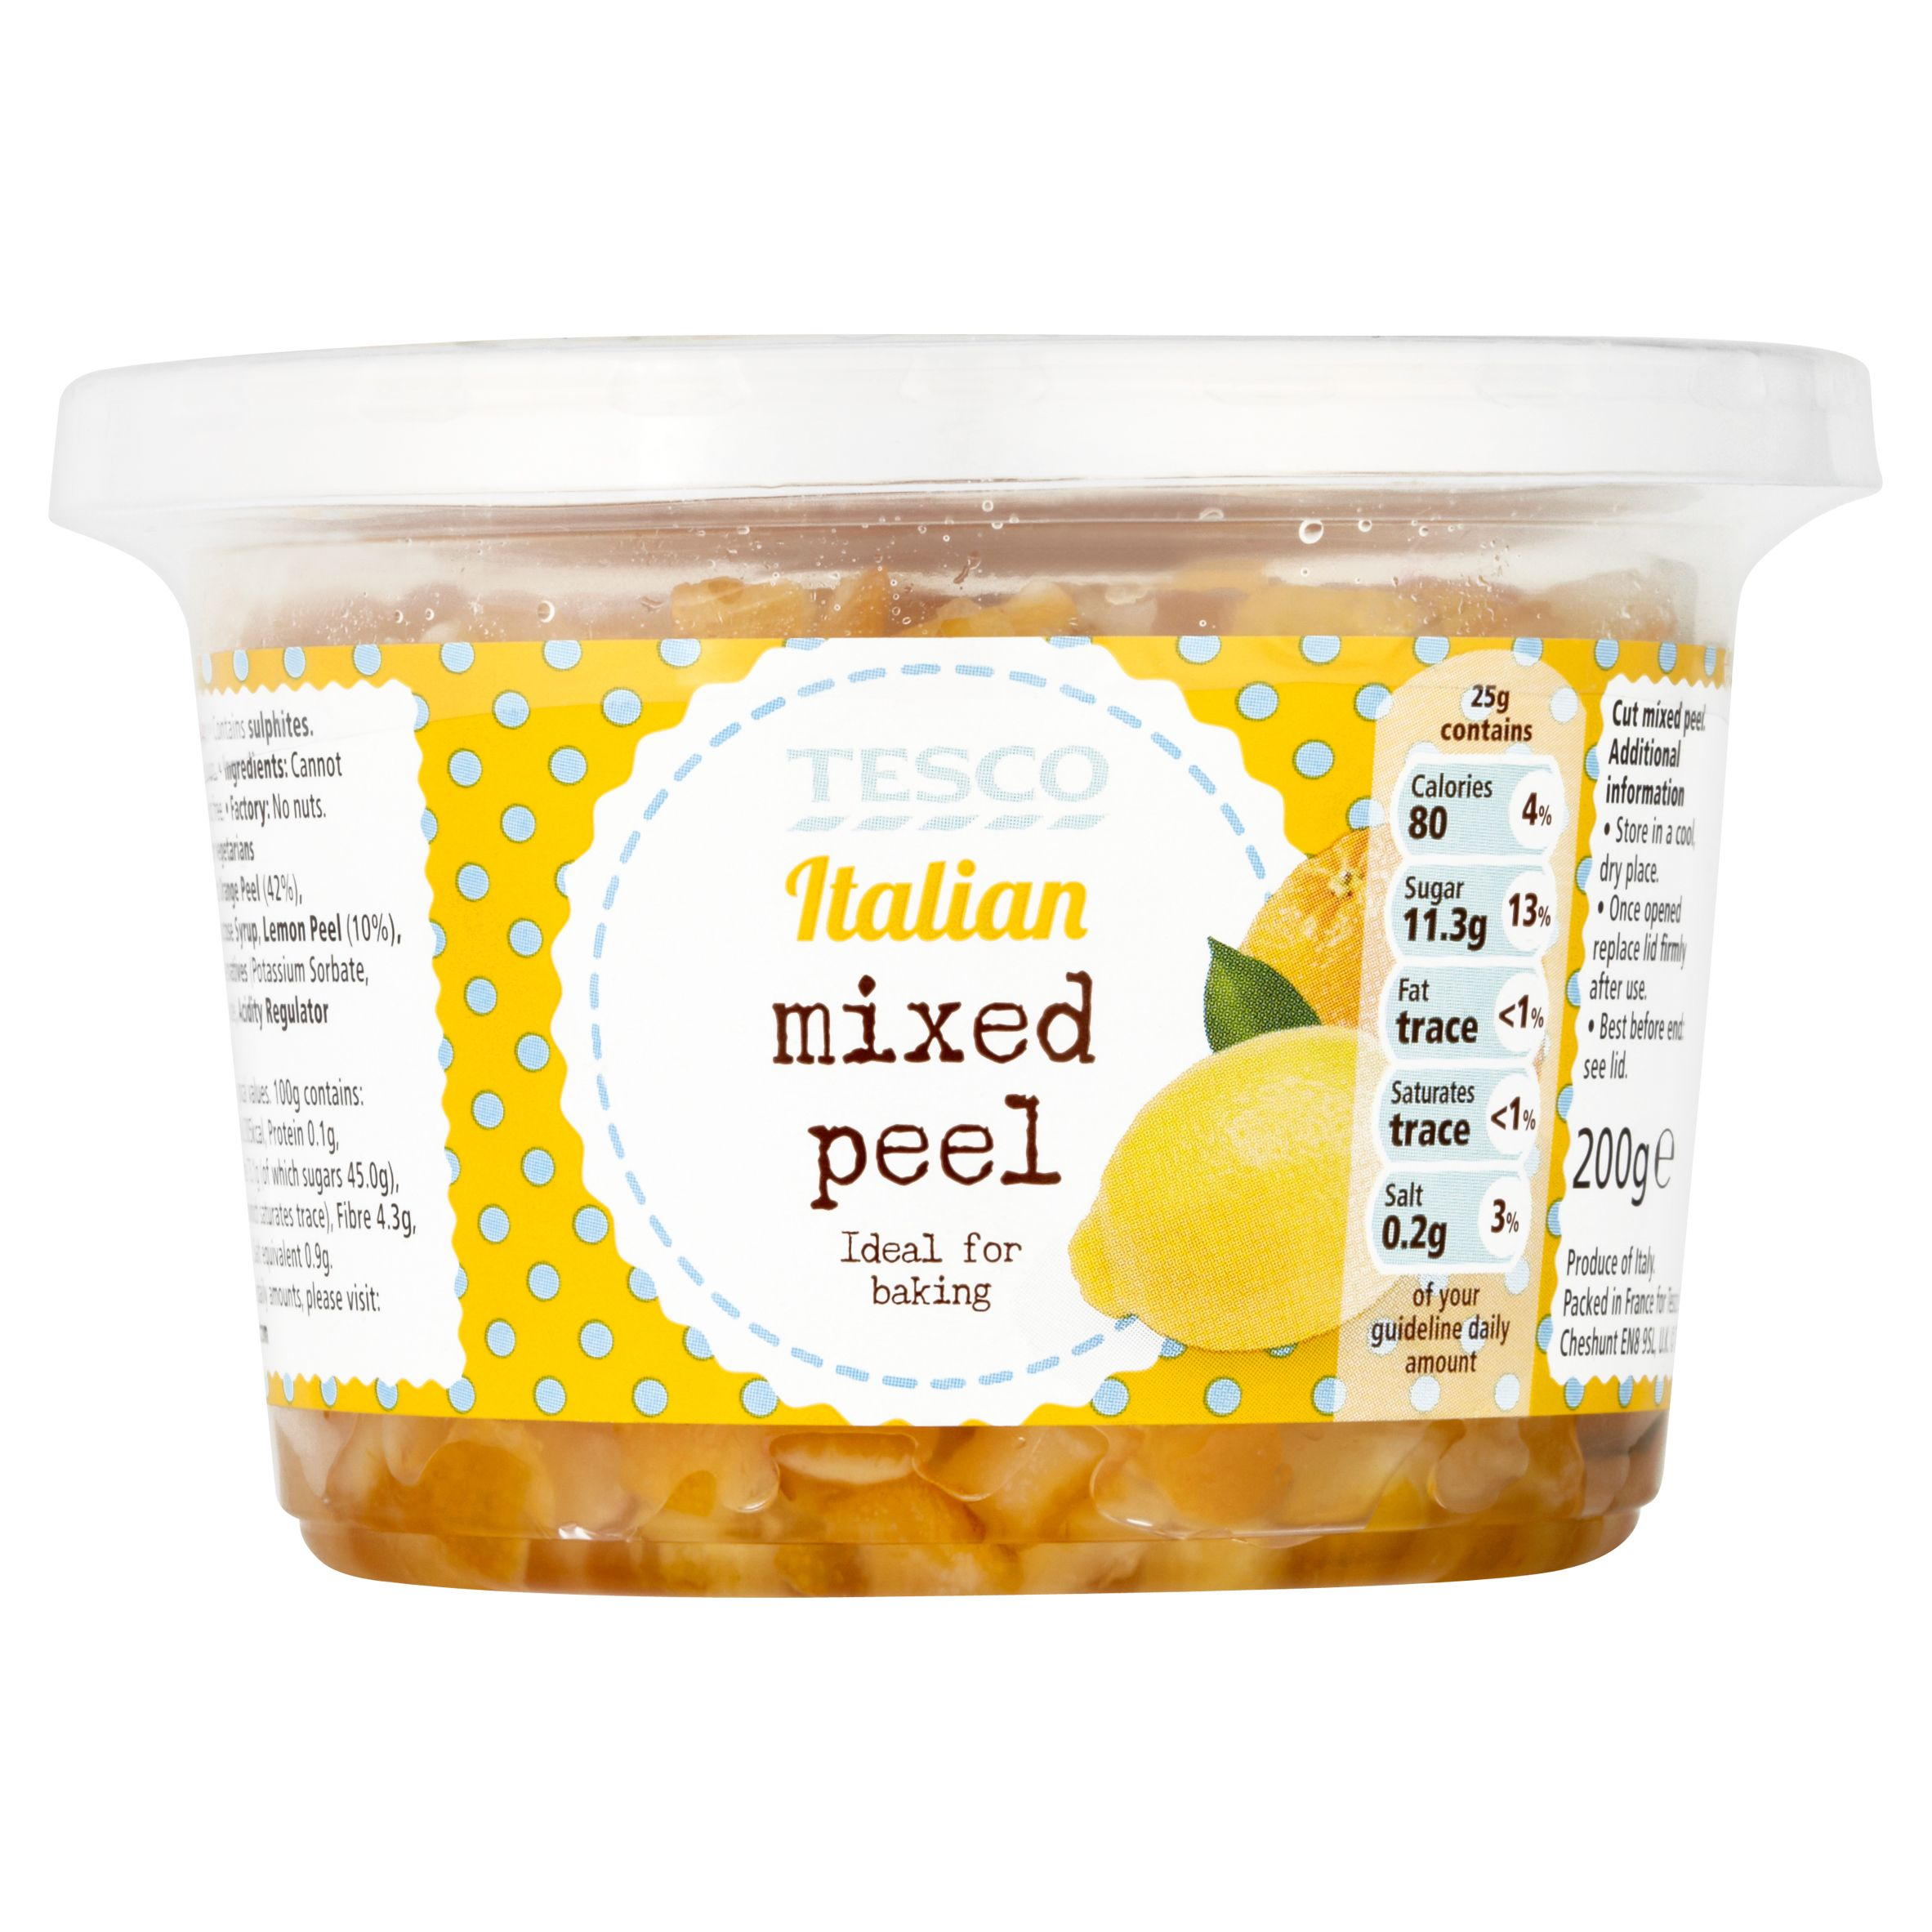 Tesco! #Italian mixed peel. | Tesco Product Range | Pinterest